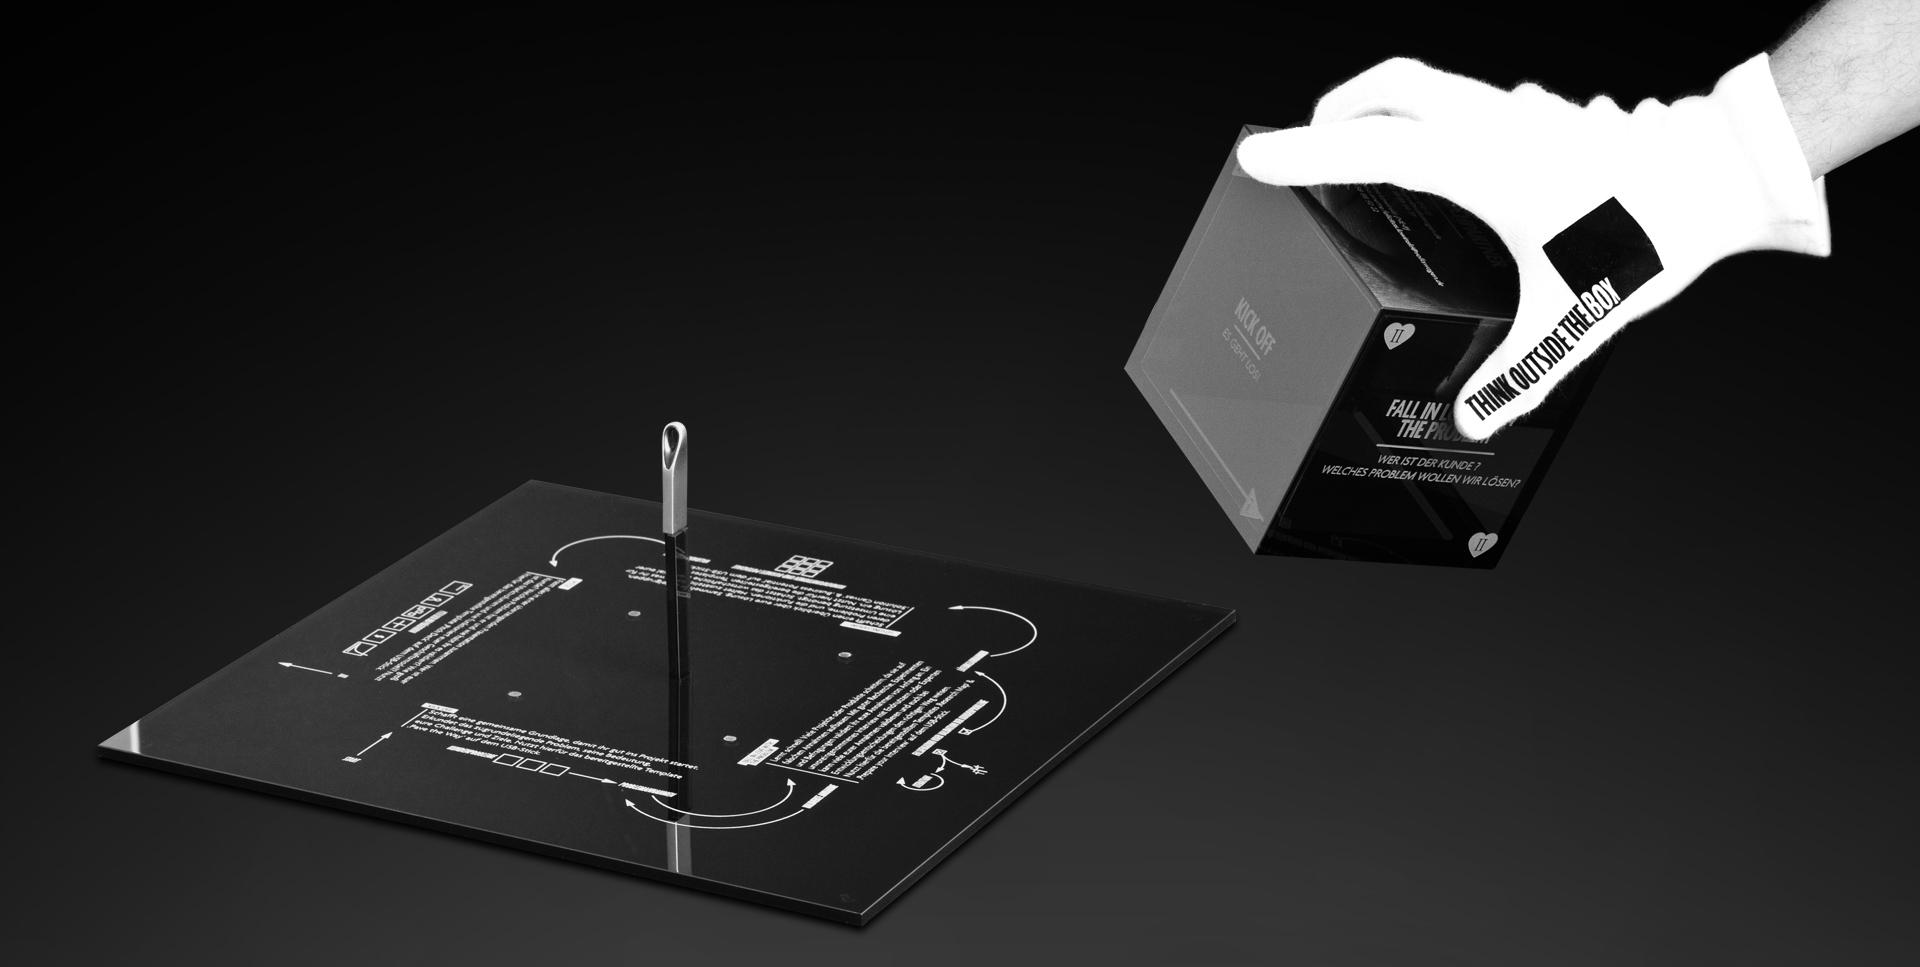 Trophy-STUDIO-MUNIQUE-2